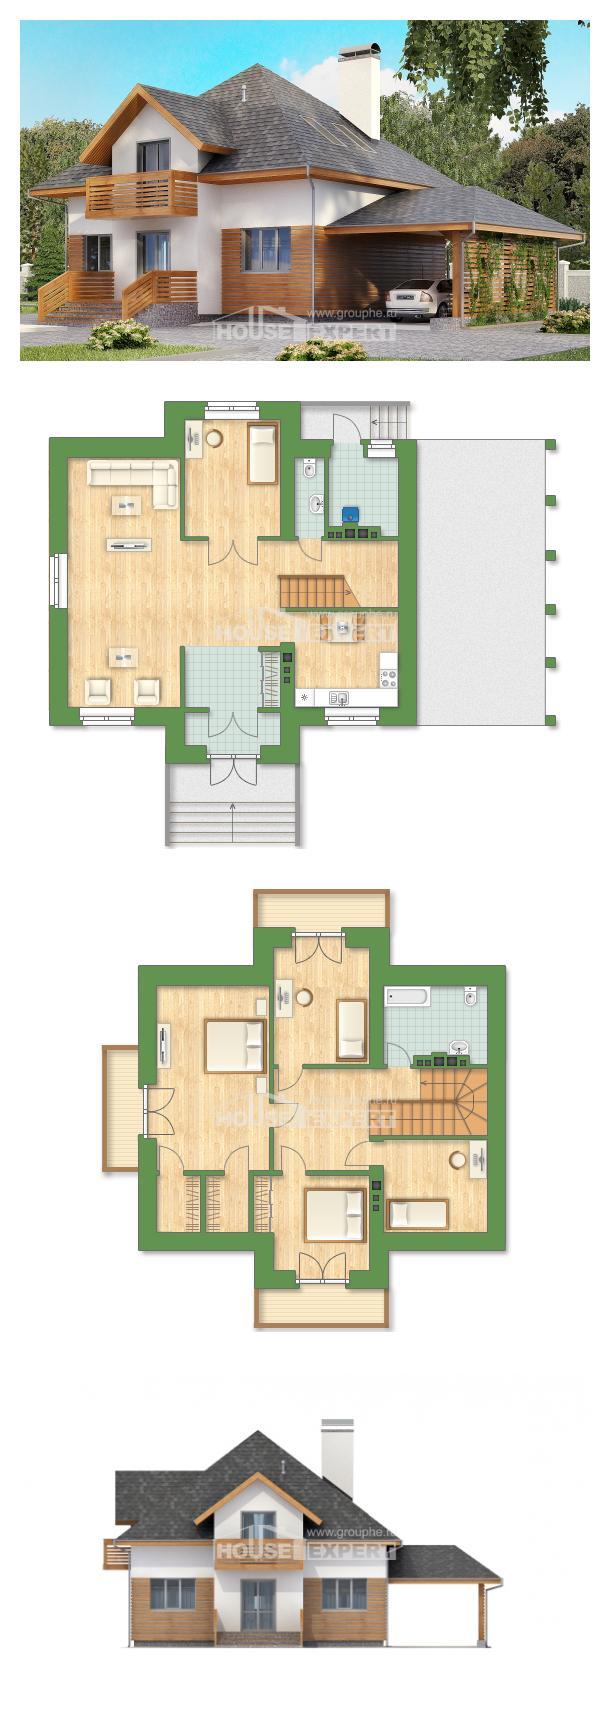 Projekt domu 155-004-R | House Expert